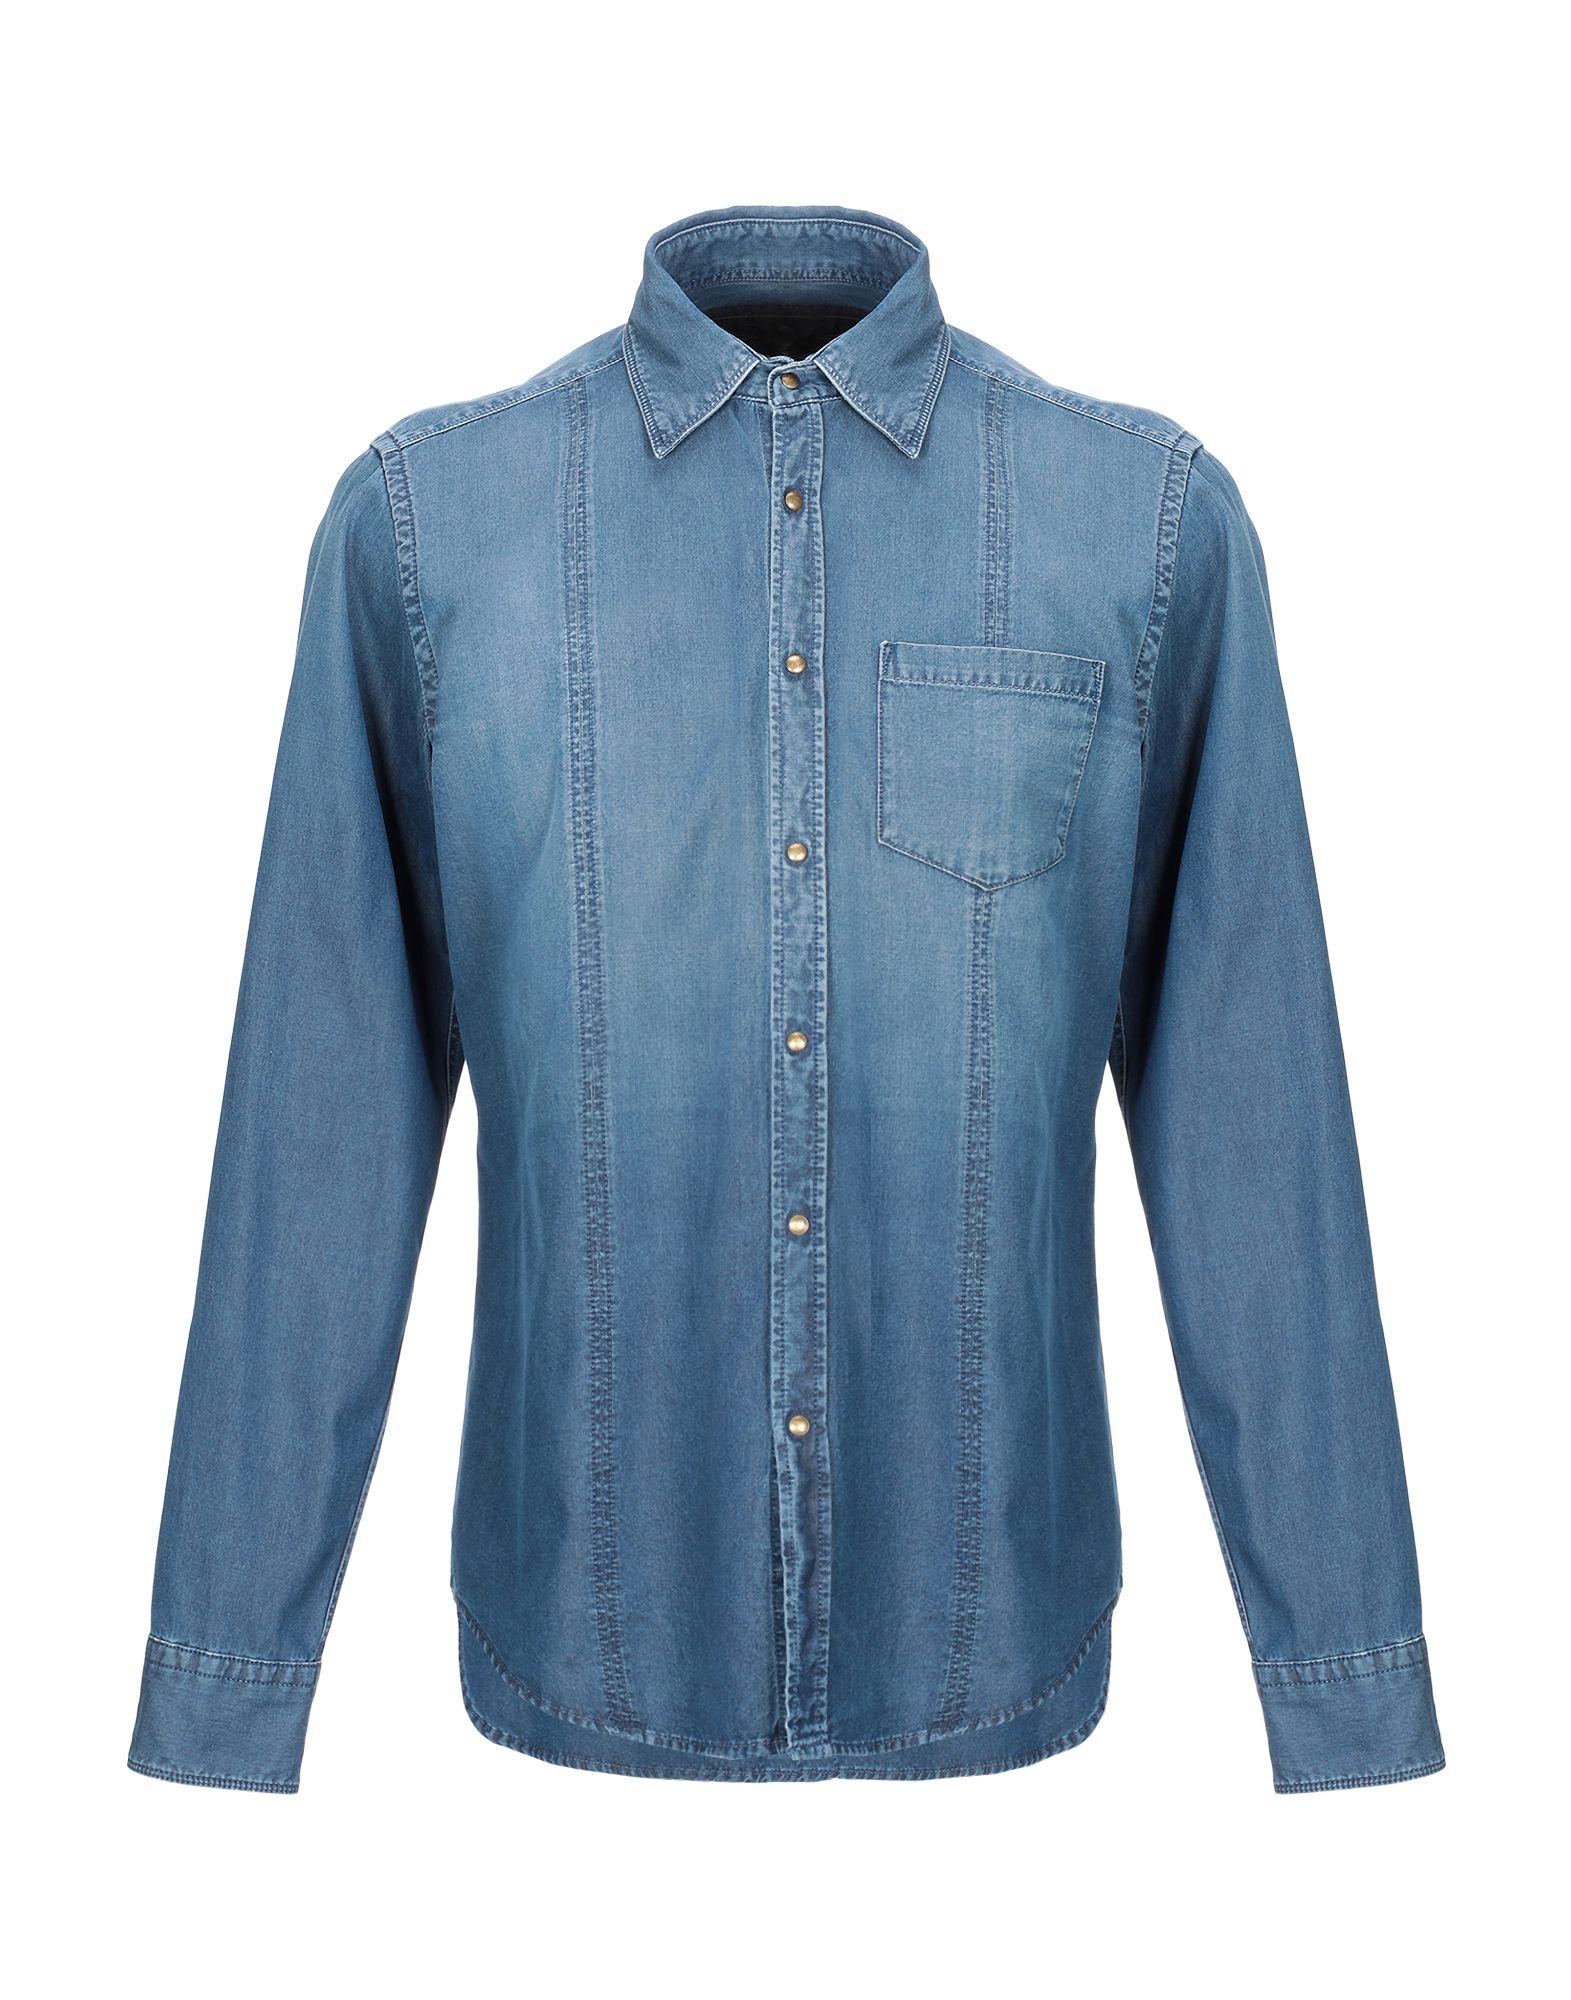 NOHOW X MESSAGERIE Джинсовая рубашка theory джинсовая рубашка